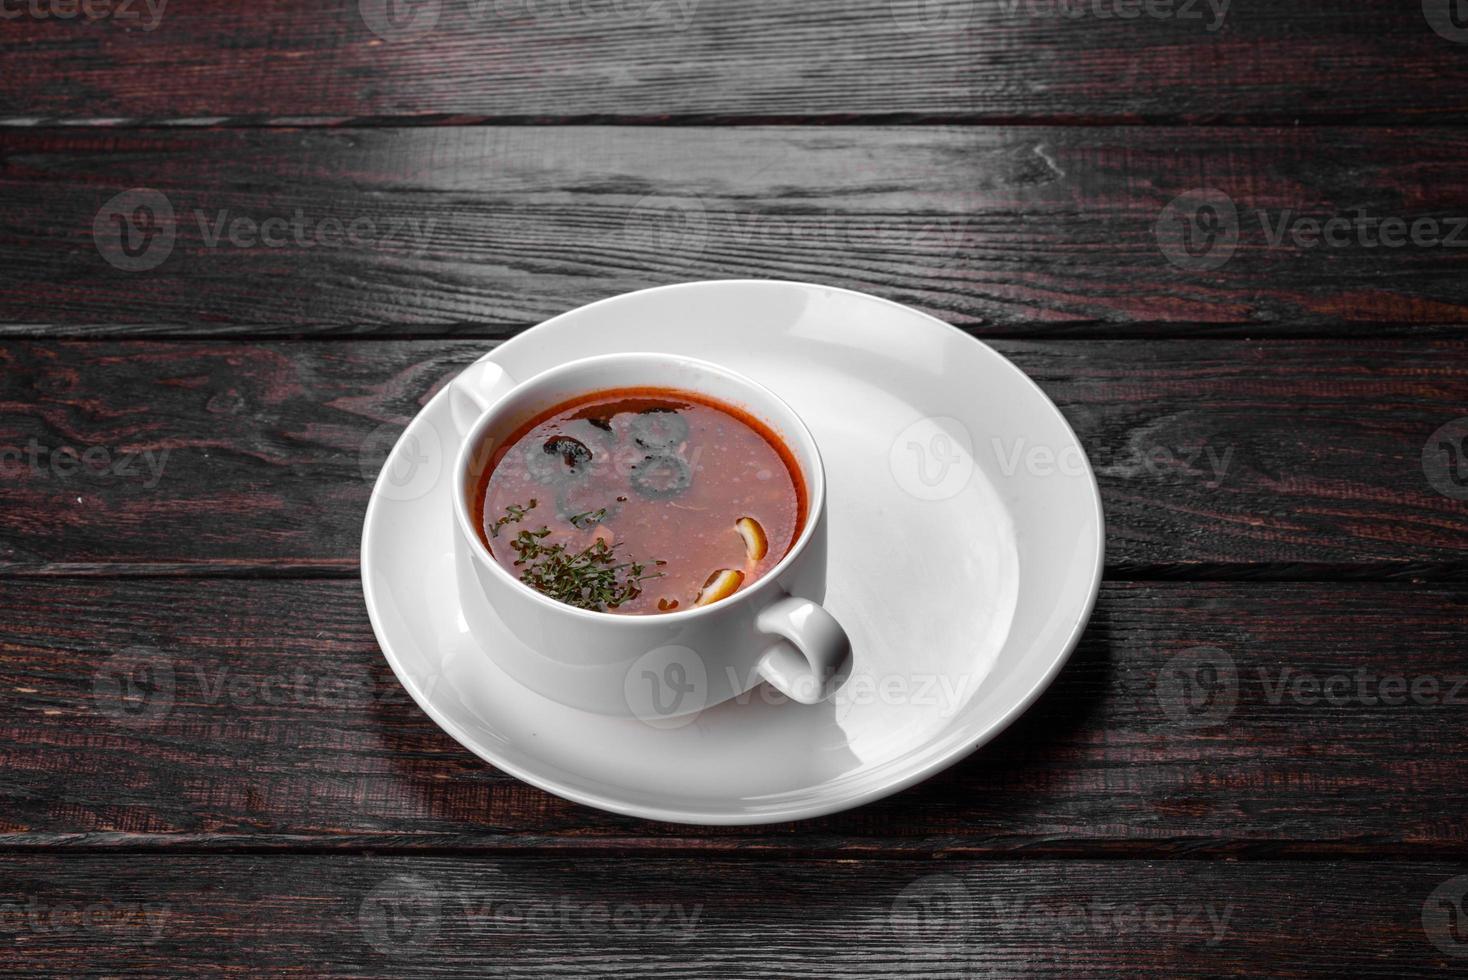 Apetitoso plato de sopa de mezcolanza rusa en olla de cerámica foto